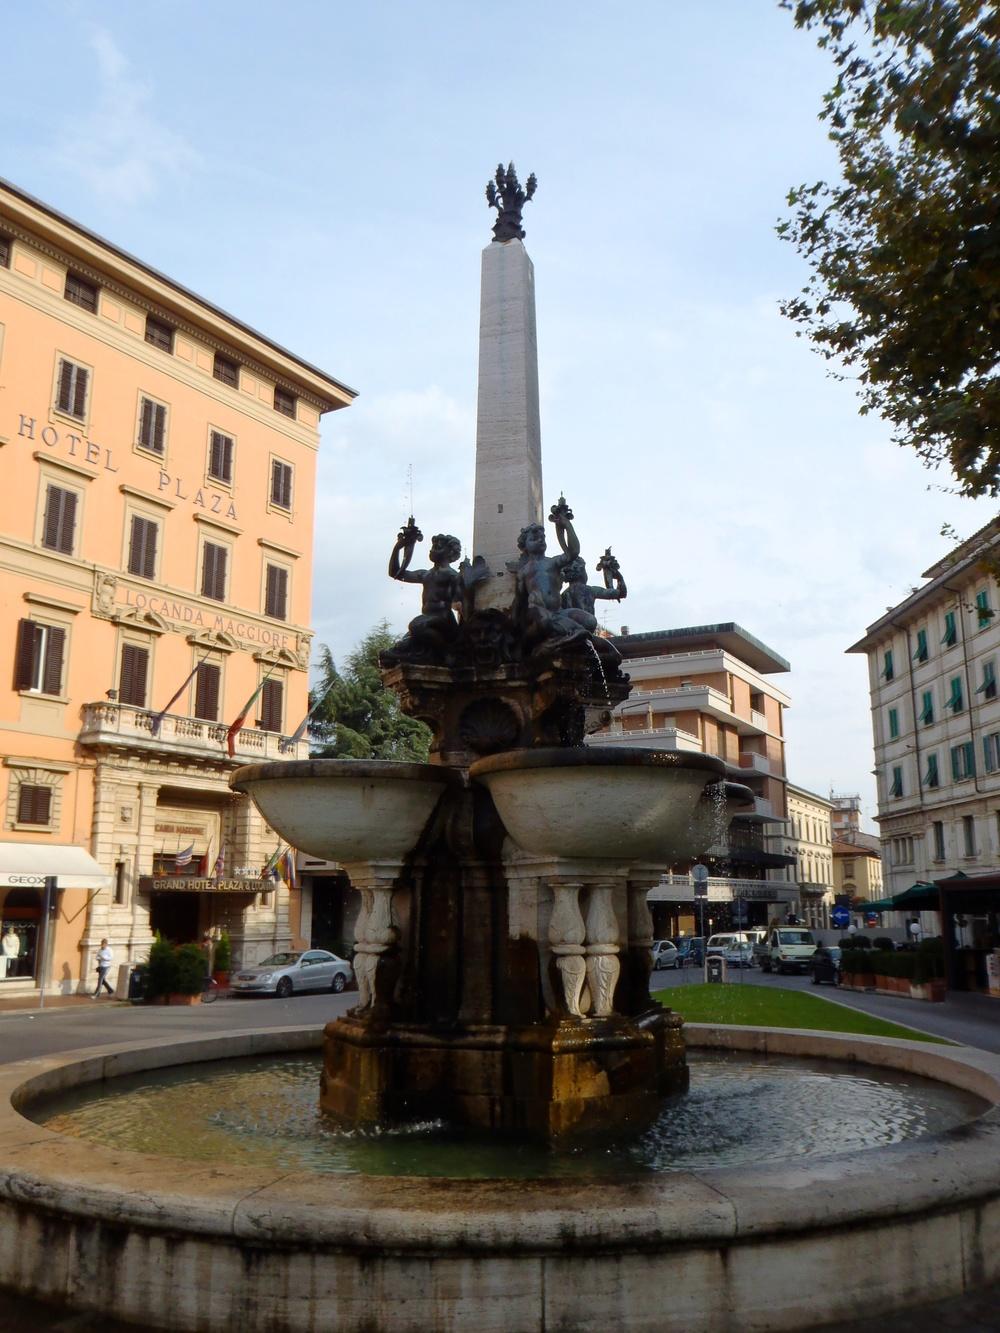 CRO Italy web 2010 - 32.jpg